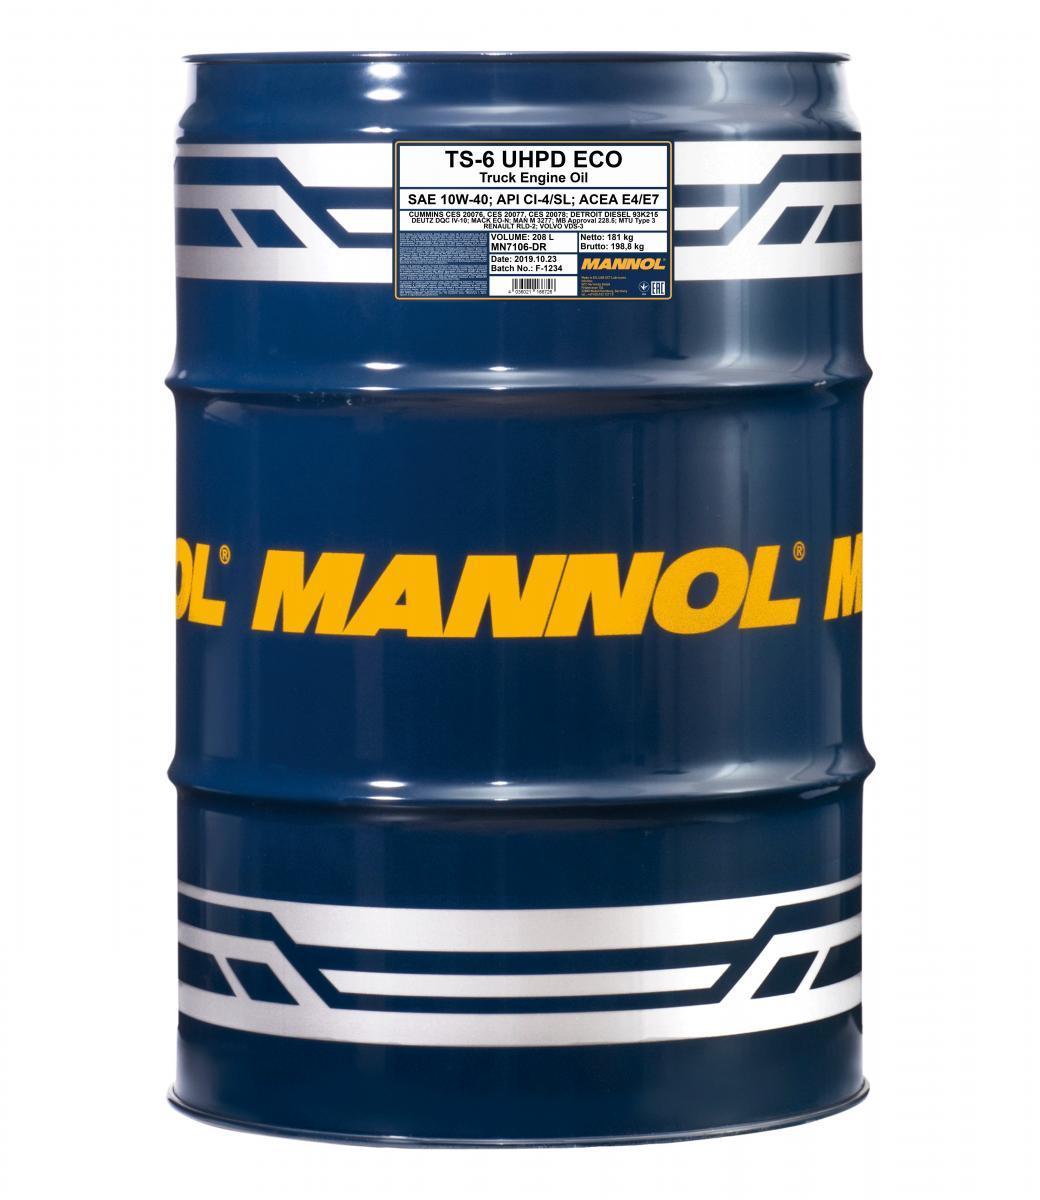 MN7106-DR MANNOL TS-6, UHPD Eco 10W-40, 10W-40, 208l Motoröl MN7106-DR günstig kaufen